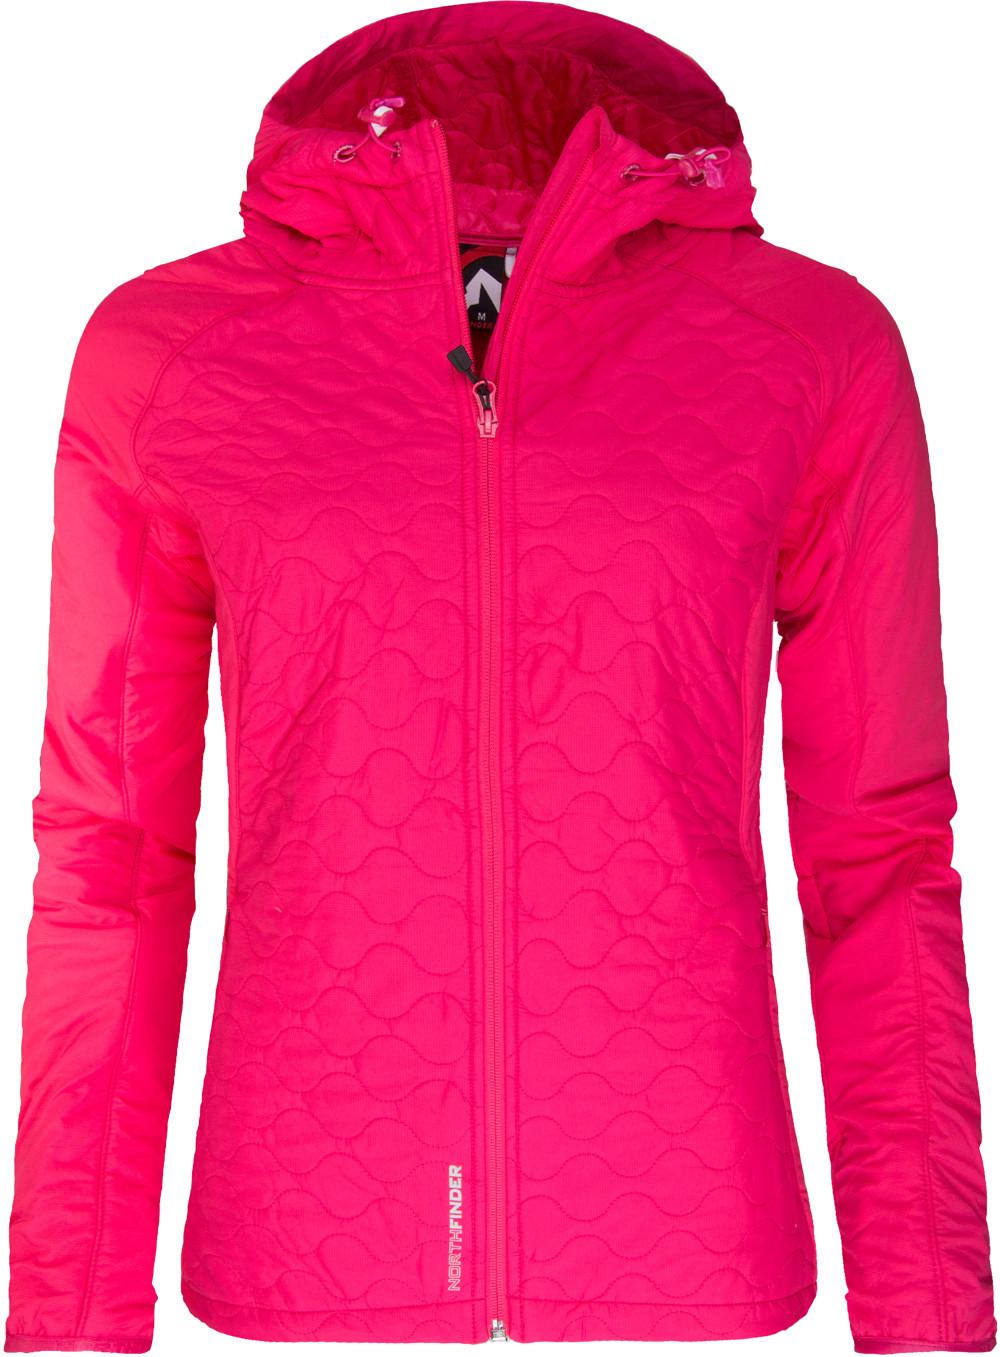 77a408908eef Predaj skončil - Women s winter jacket NORTHFINDER LAIMA